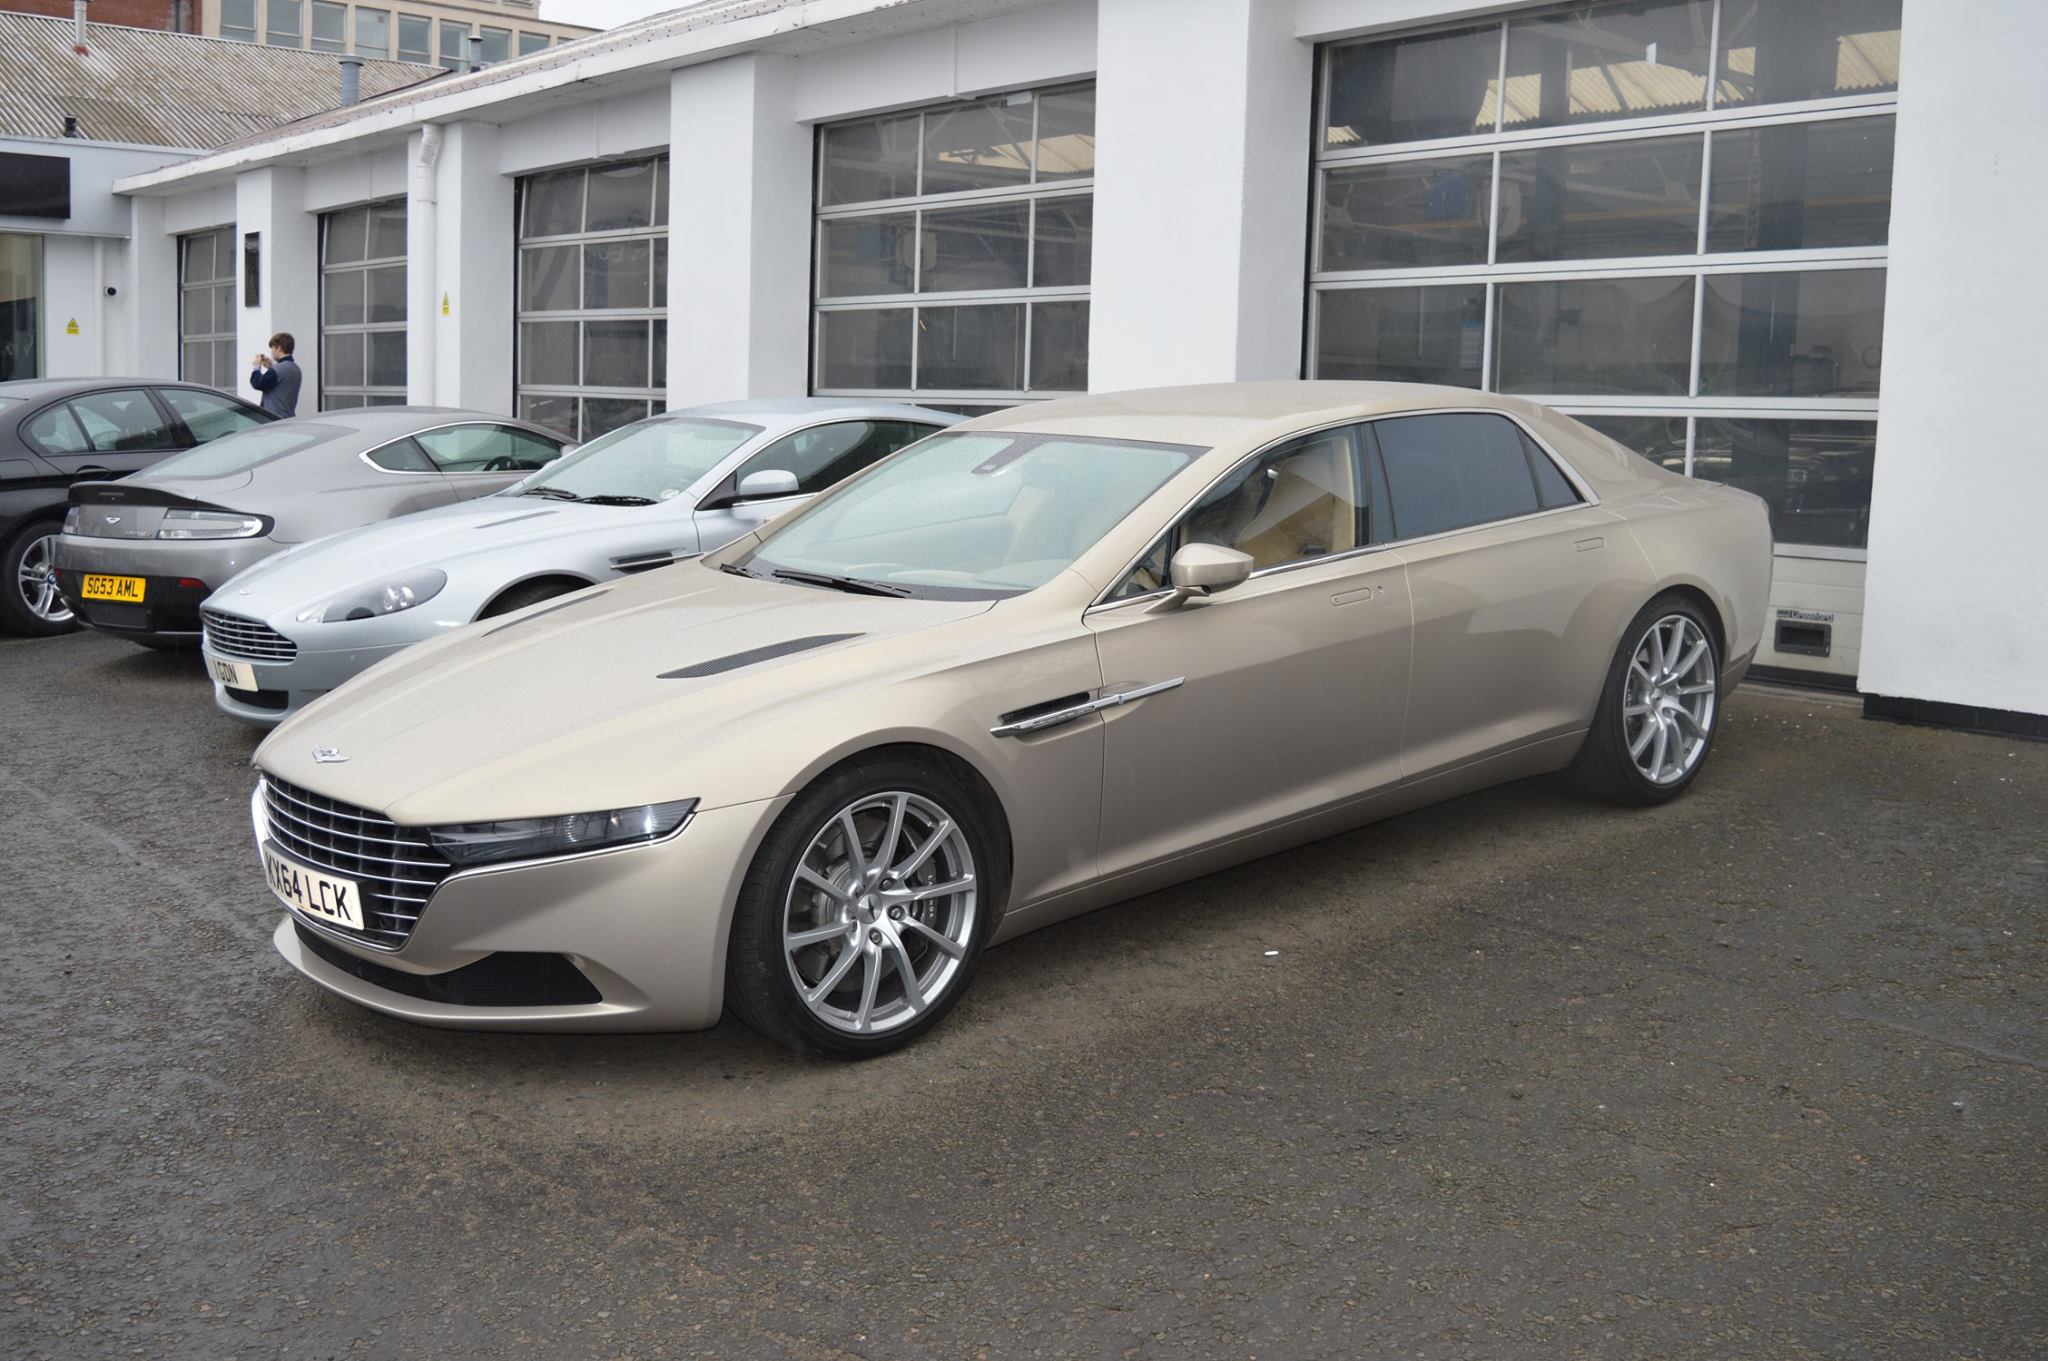 Rare Aston Martin Lagonda Taraf Snapped In Scotland Gtspirit